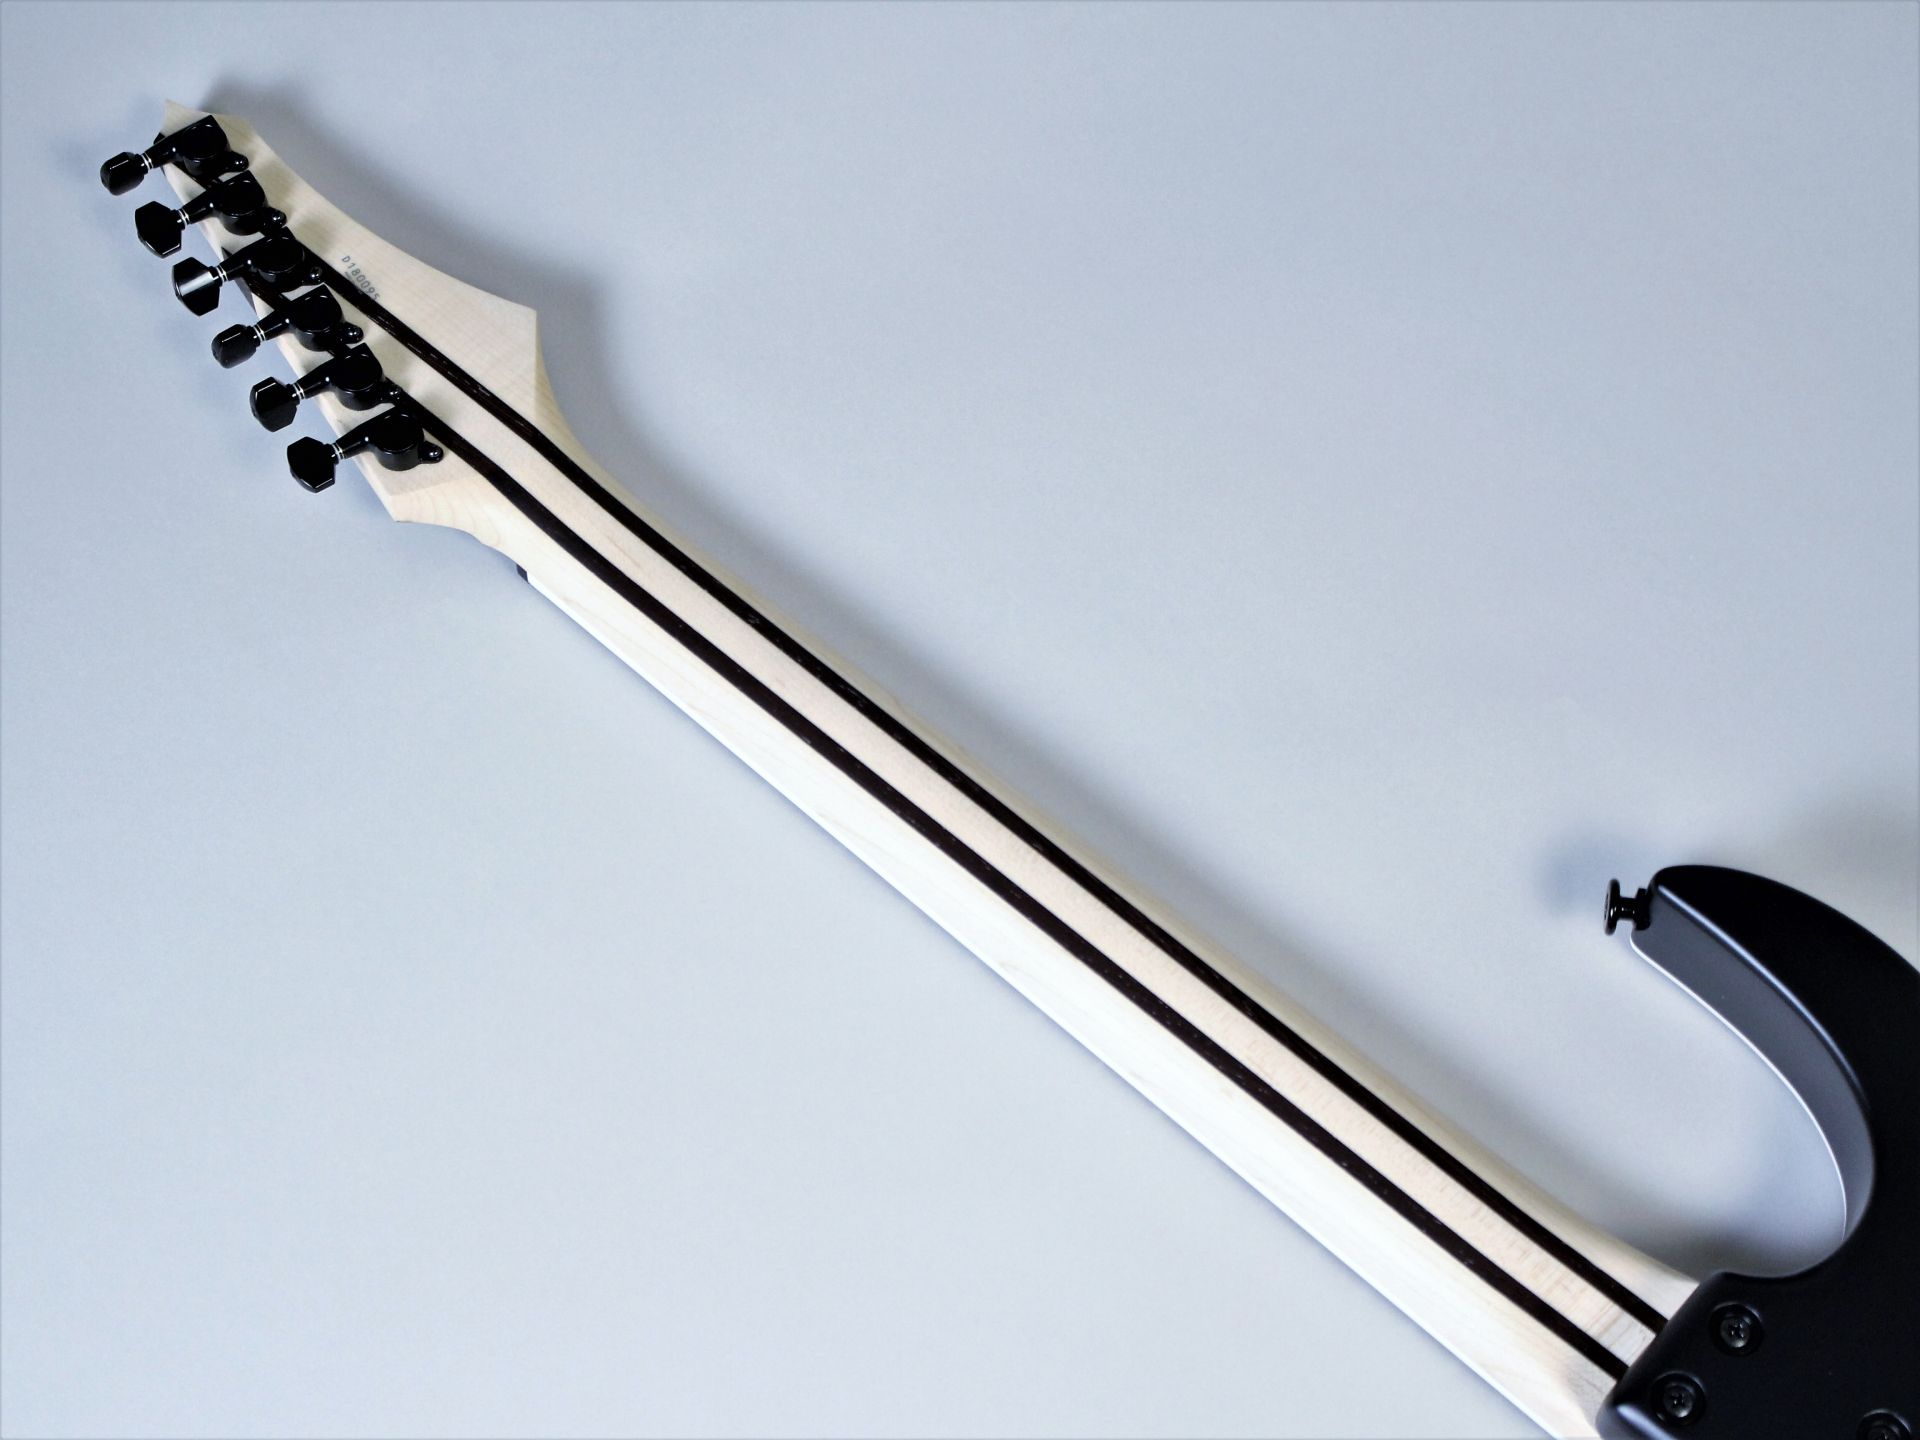 Strictly 7 Guitars – Cobra JS6 FM BBG【6本限定モデル】【4月28日発売・予約受付中】のボディバック-アップ画像